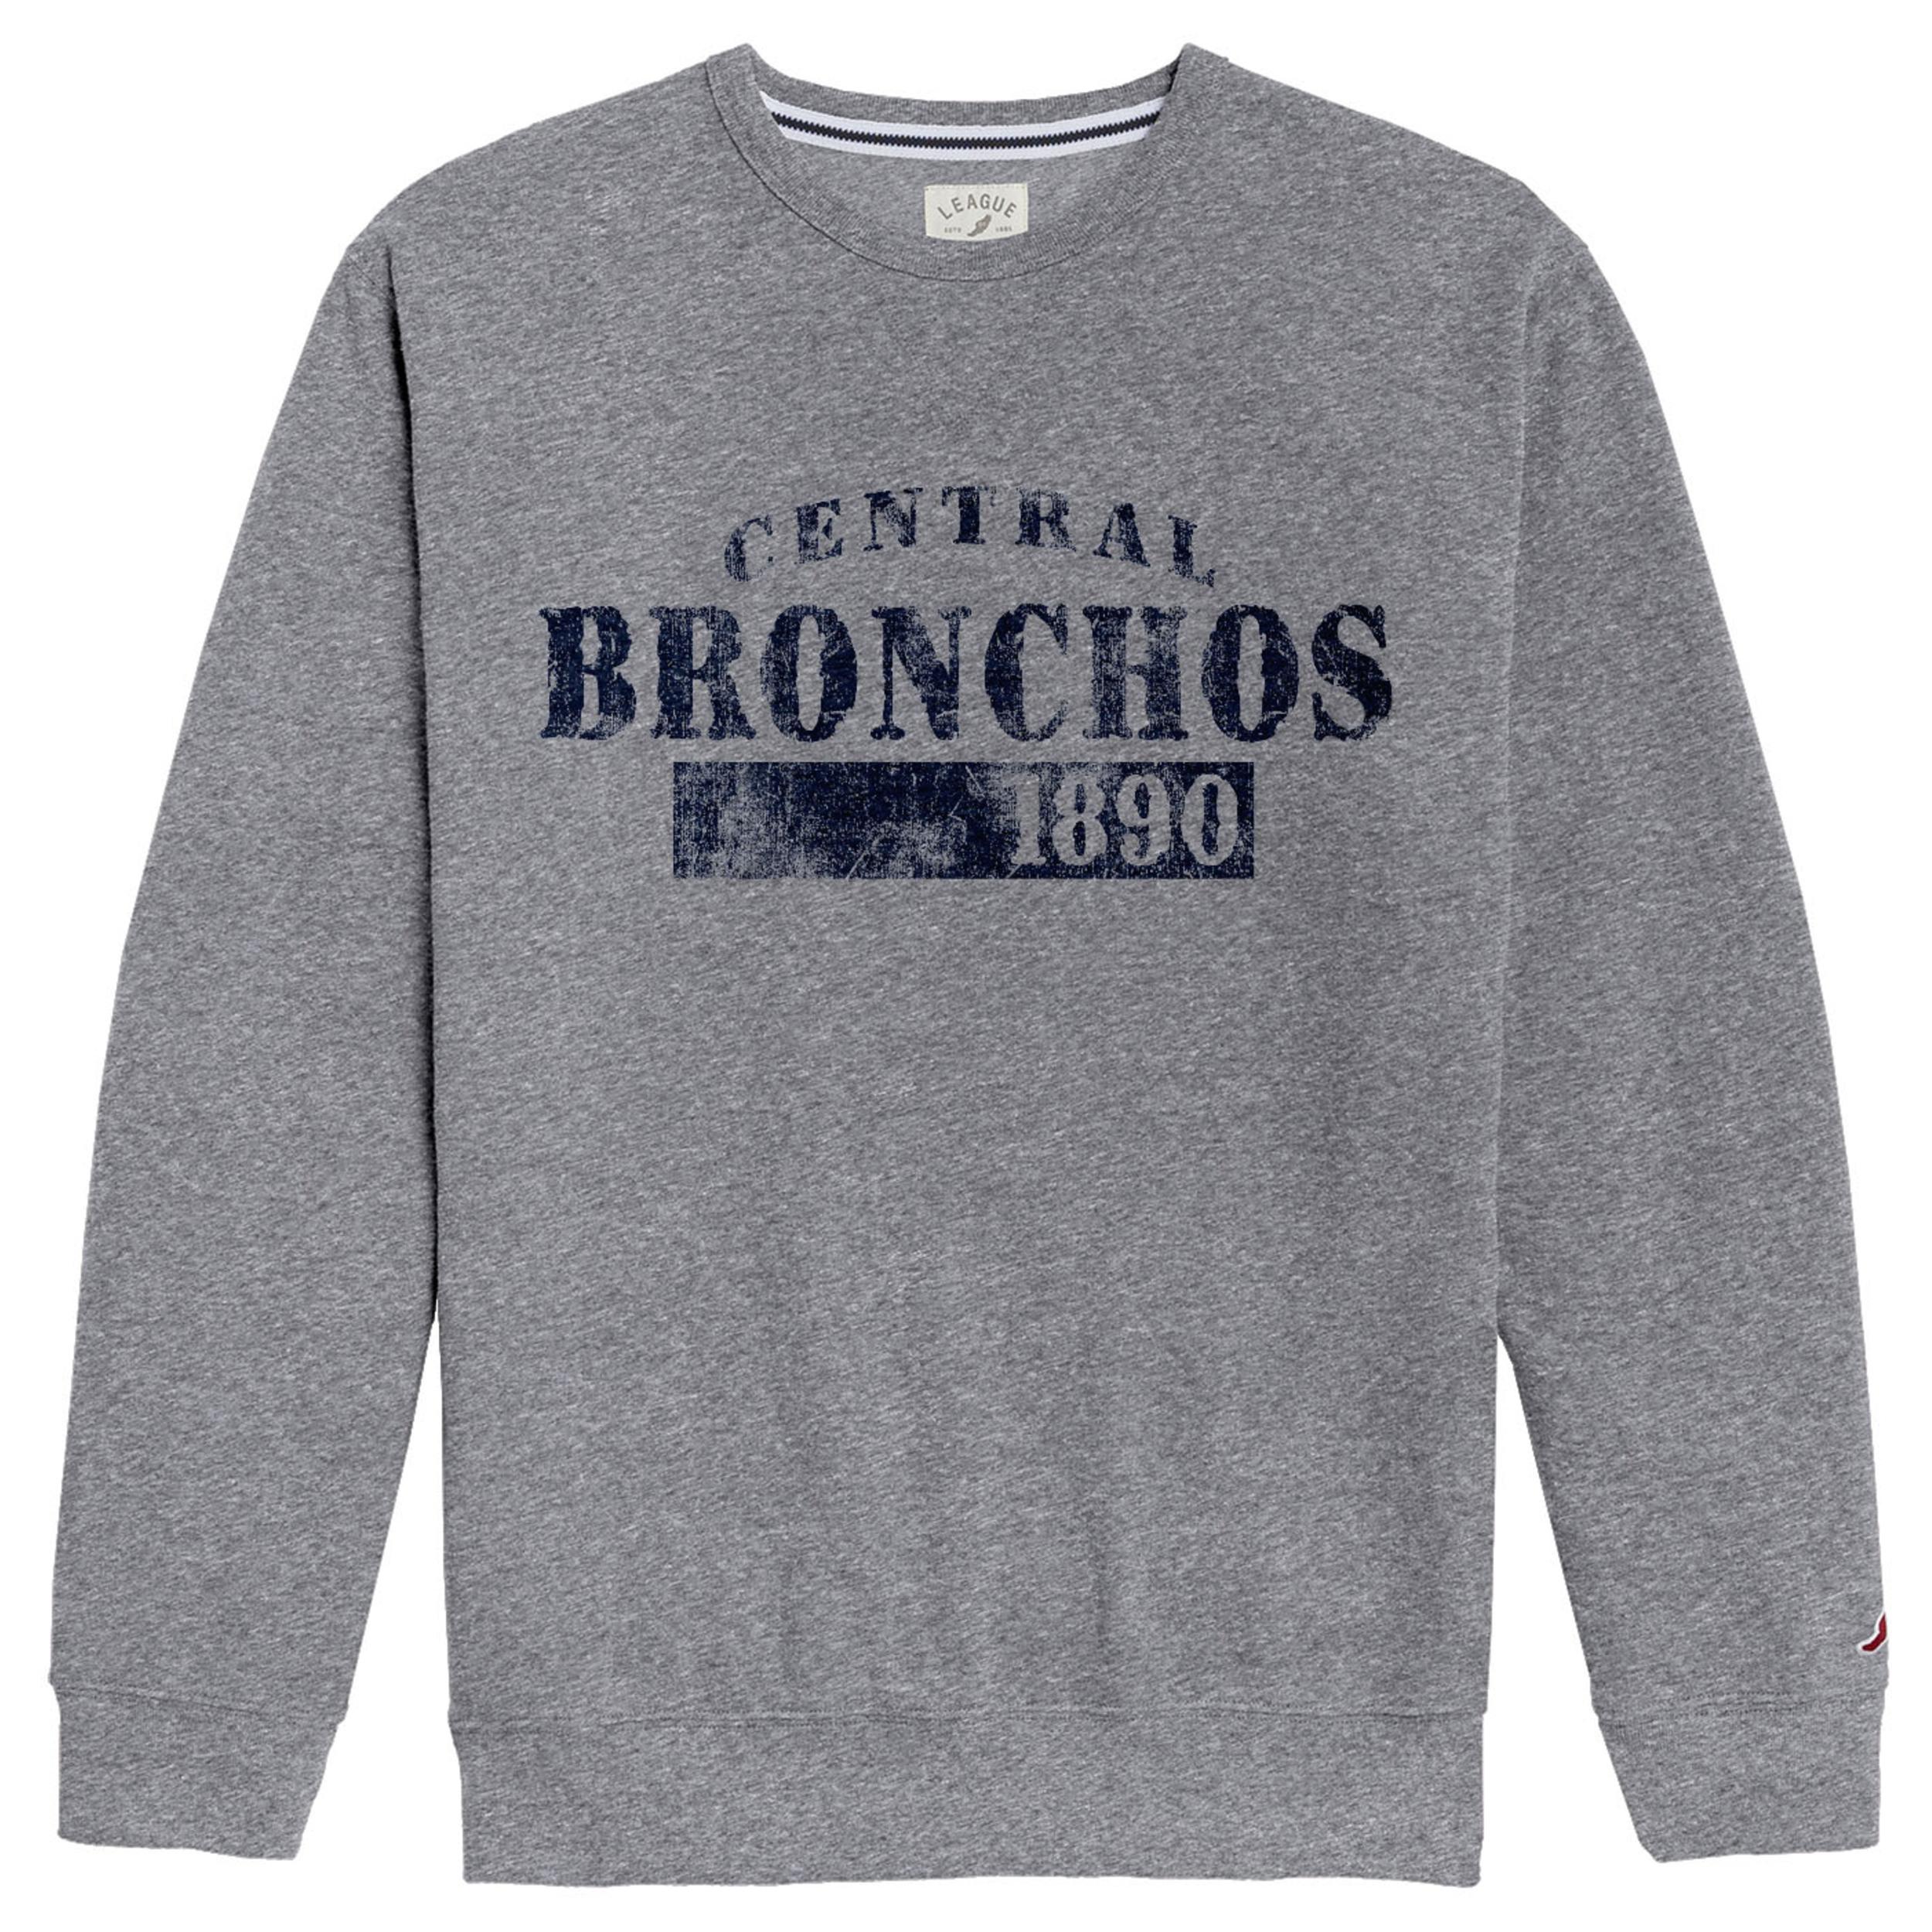 Central Bronchos Heritage Crew